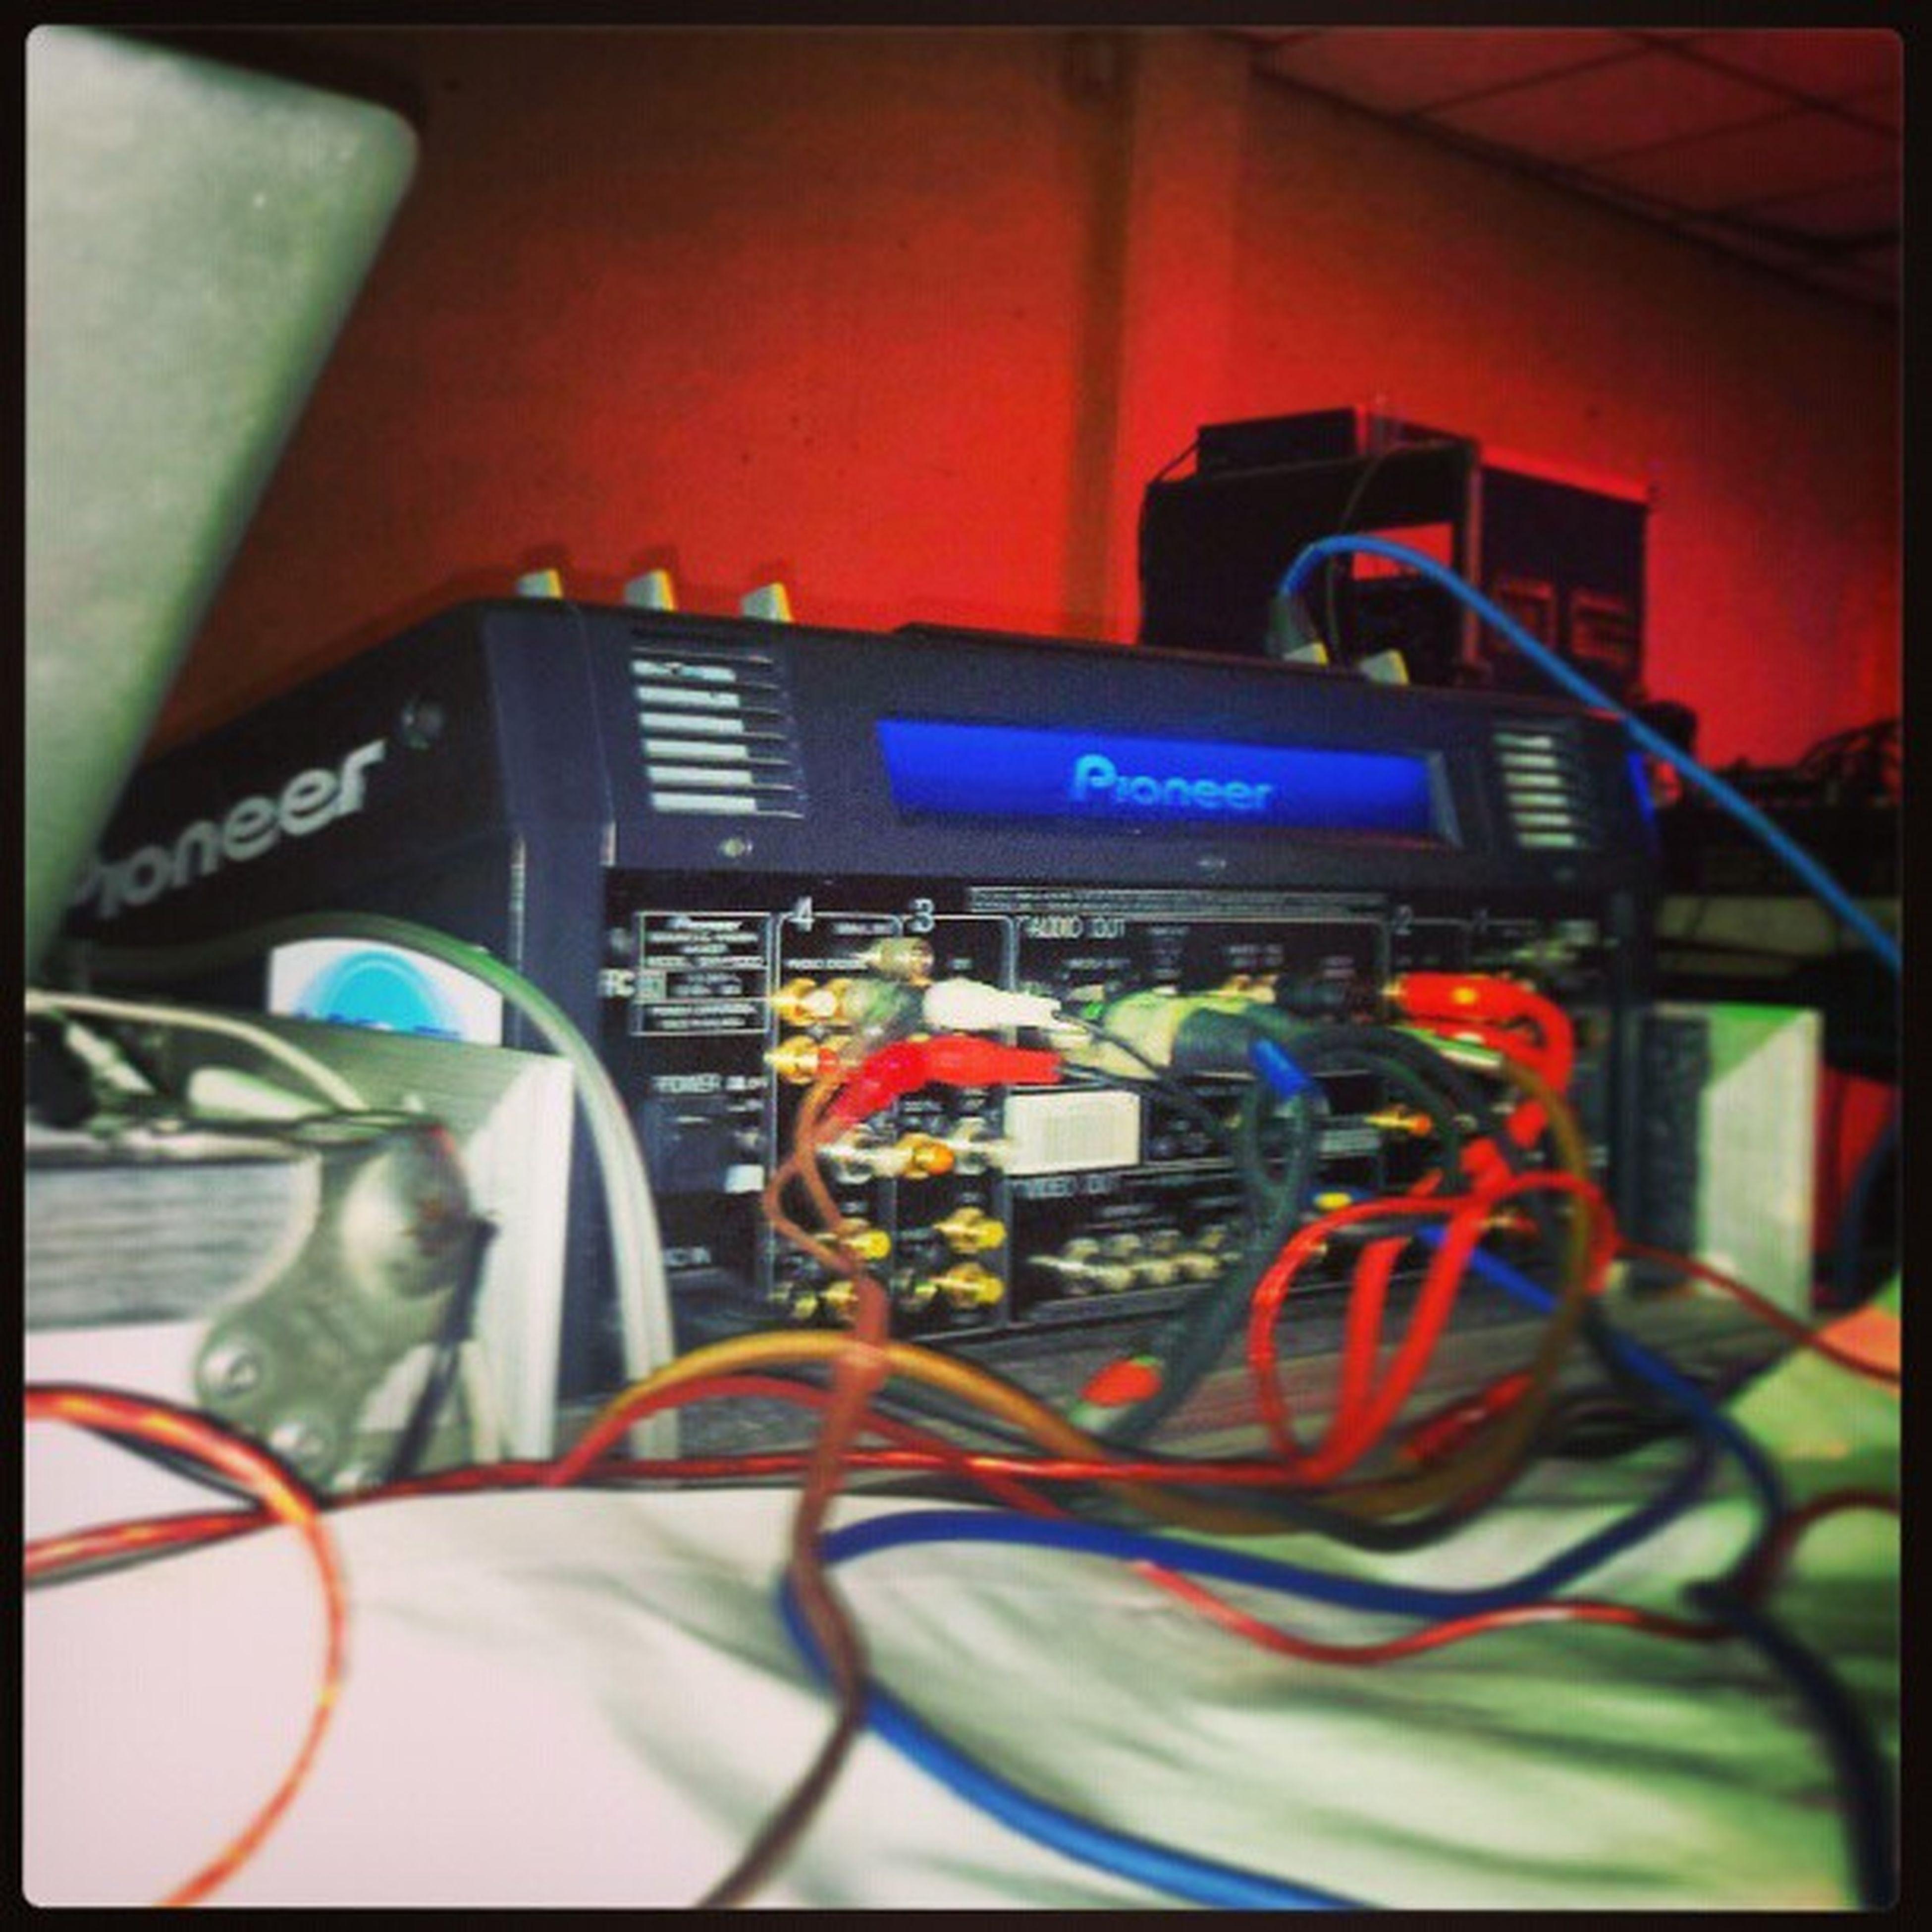 Svm1000 SVM -1000 Pioneer Dj cdj México instacool mixer antro Marko Maldonado producer